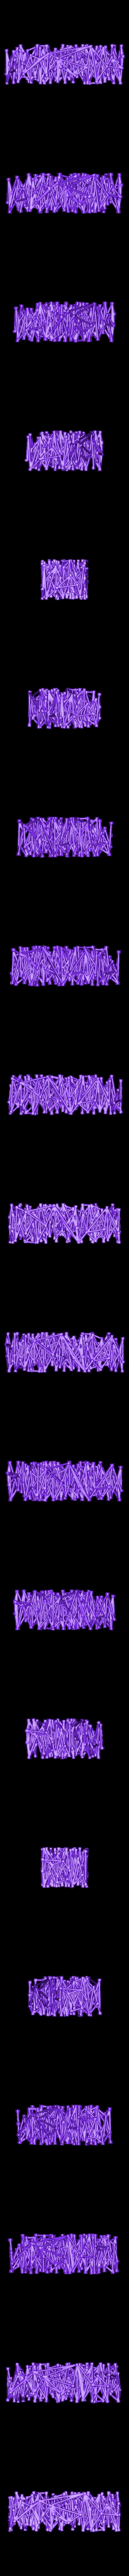 3-dDEL_print.stl Download free STL file Particle exploration A_9 • 3D printer design, Tarkhubal